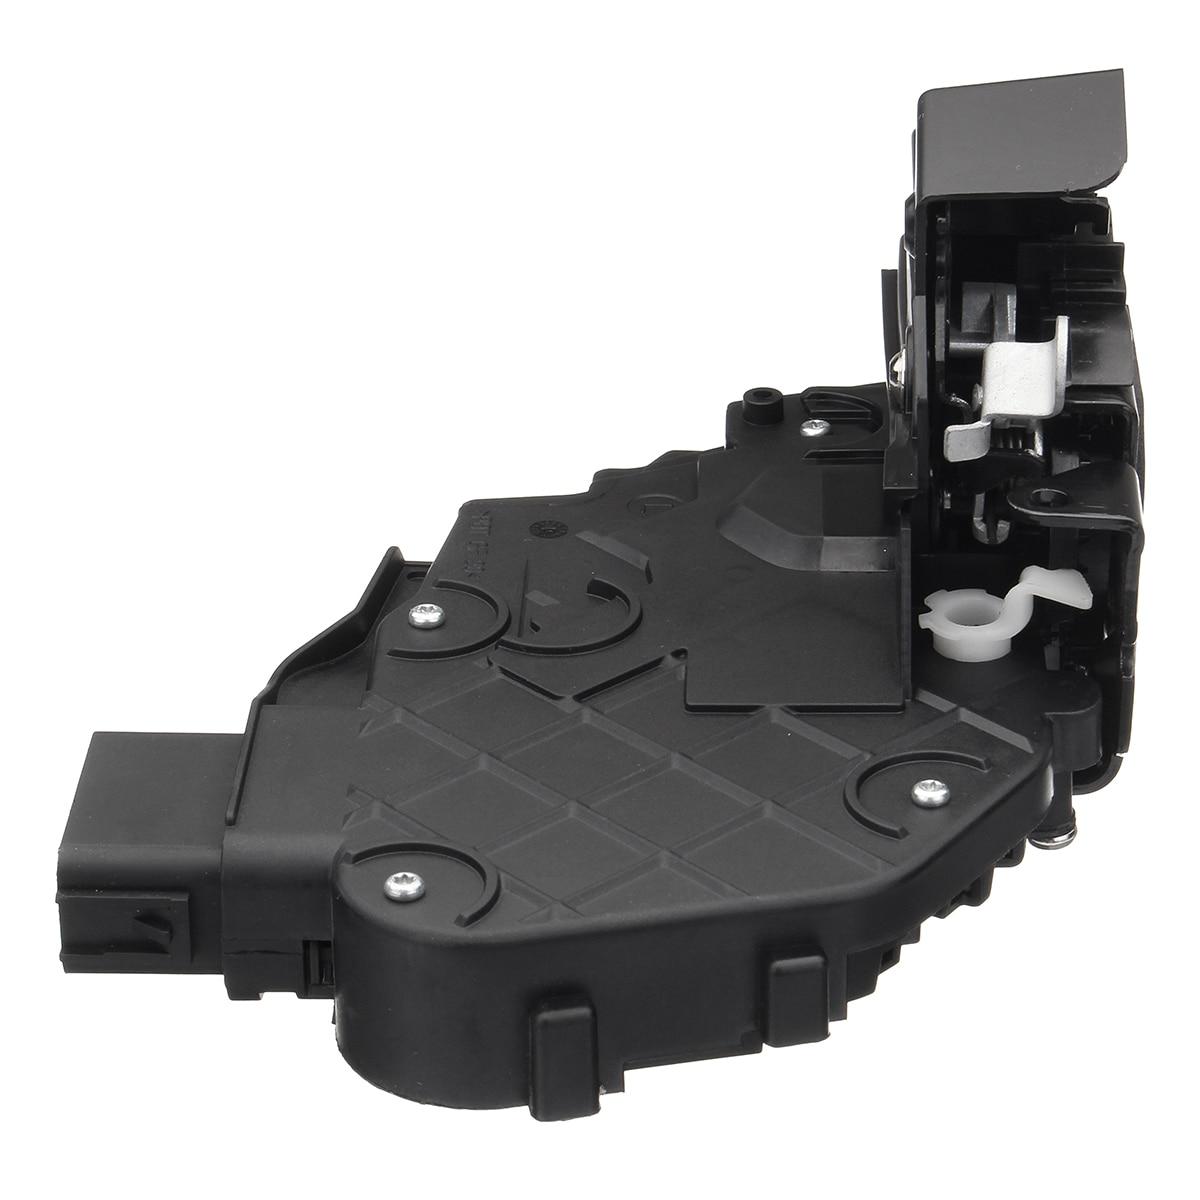 Front/Rear Left/Right Car Door Lock Latch Mechanism For Land Rover Freelander Evoque Locks Hardware Metal&Plastic Aftermarket